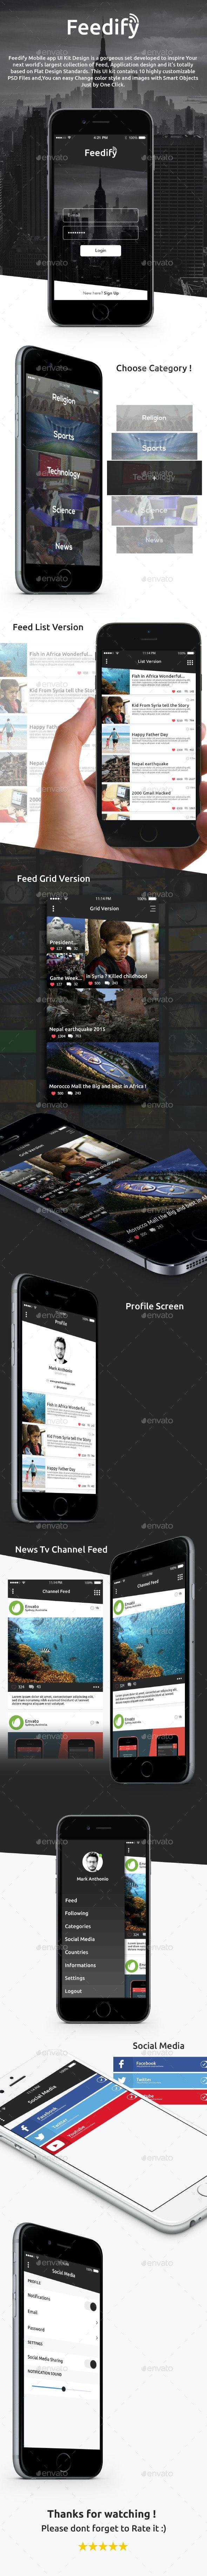 Feedify News Feed Mobile App UI Kit Design - User Interfaces Web Elements